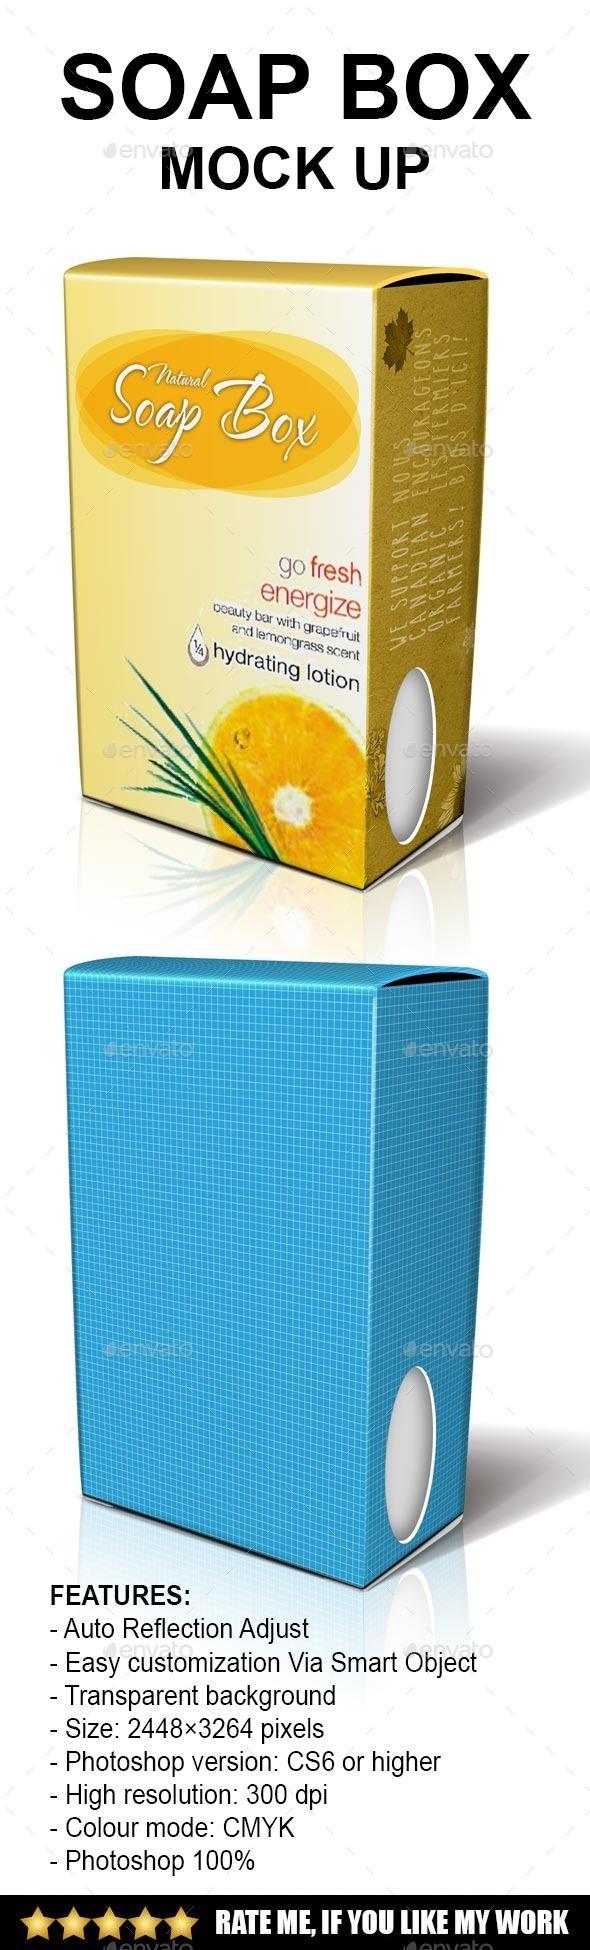 GraphicRiver Soap box Mock-up 10079506